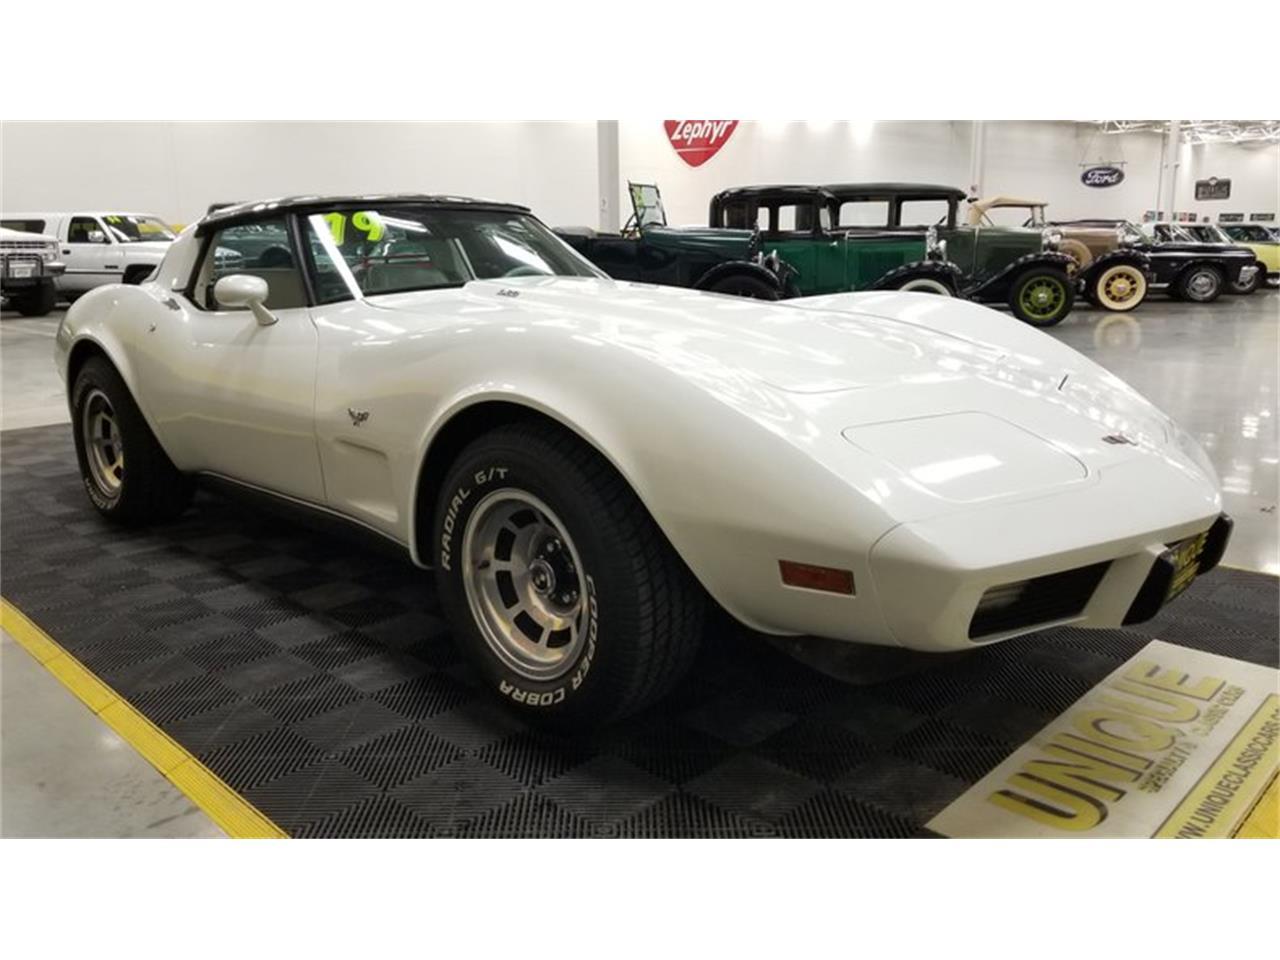 1979 Chevrolet Corvette (CC-1375964) for sale in Mankato, Minnesota